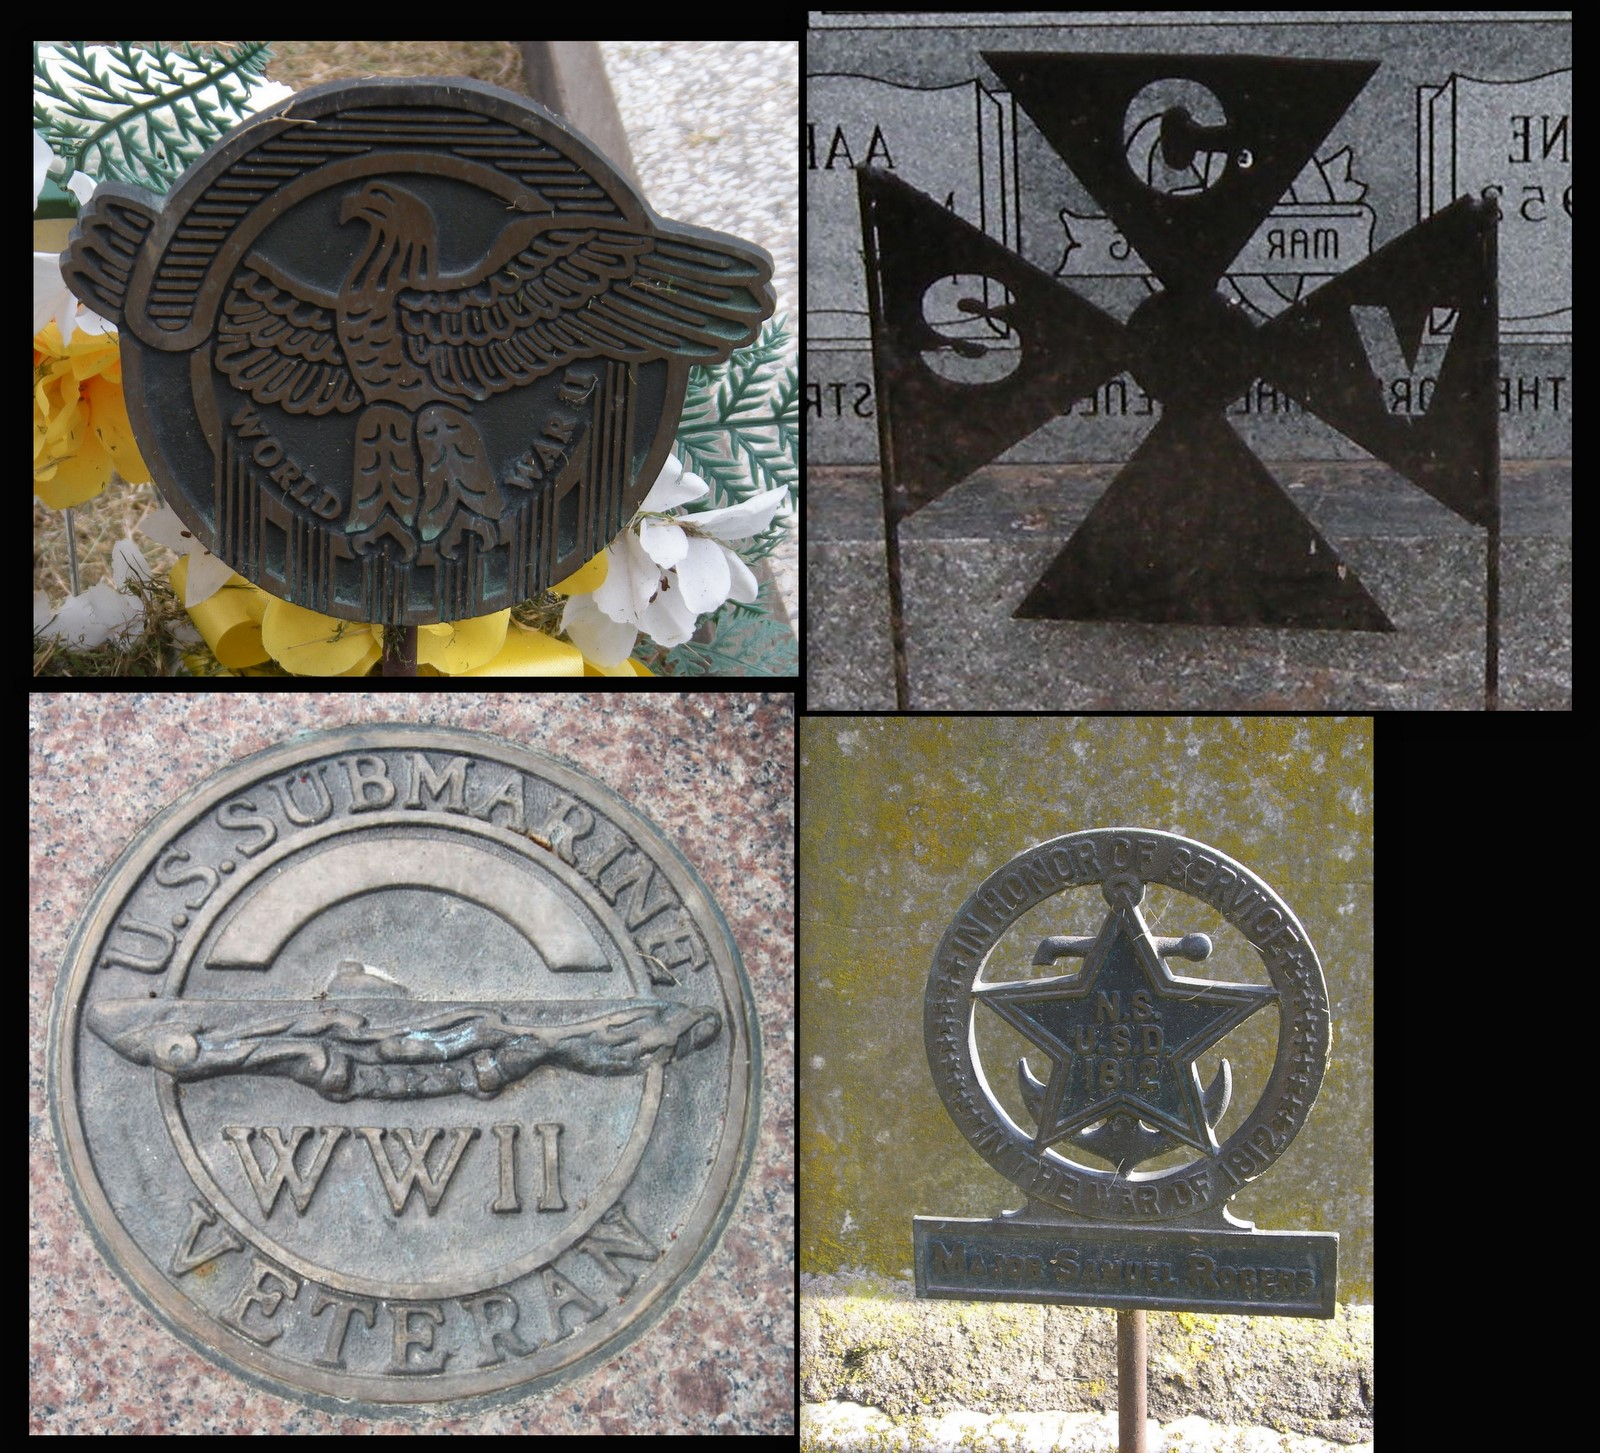 Confederate Army Symbol